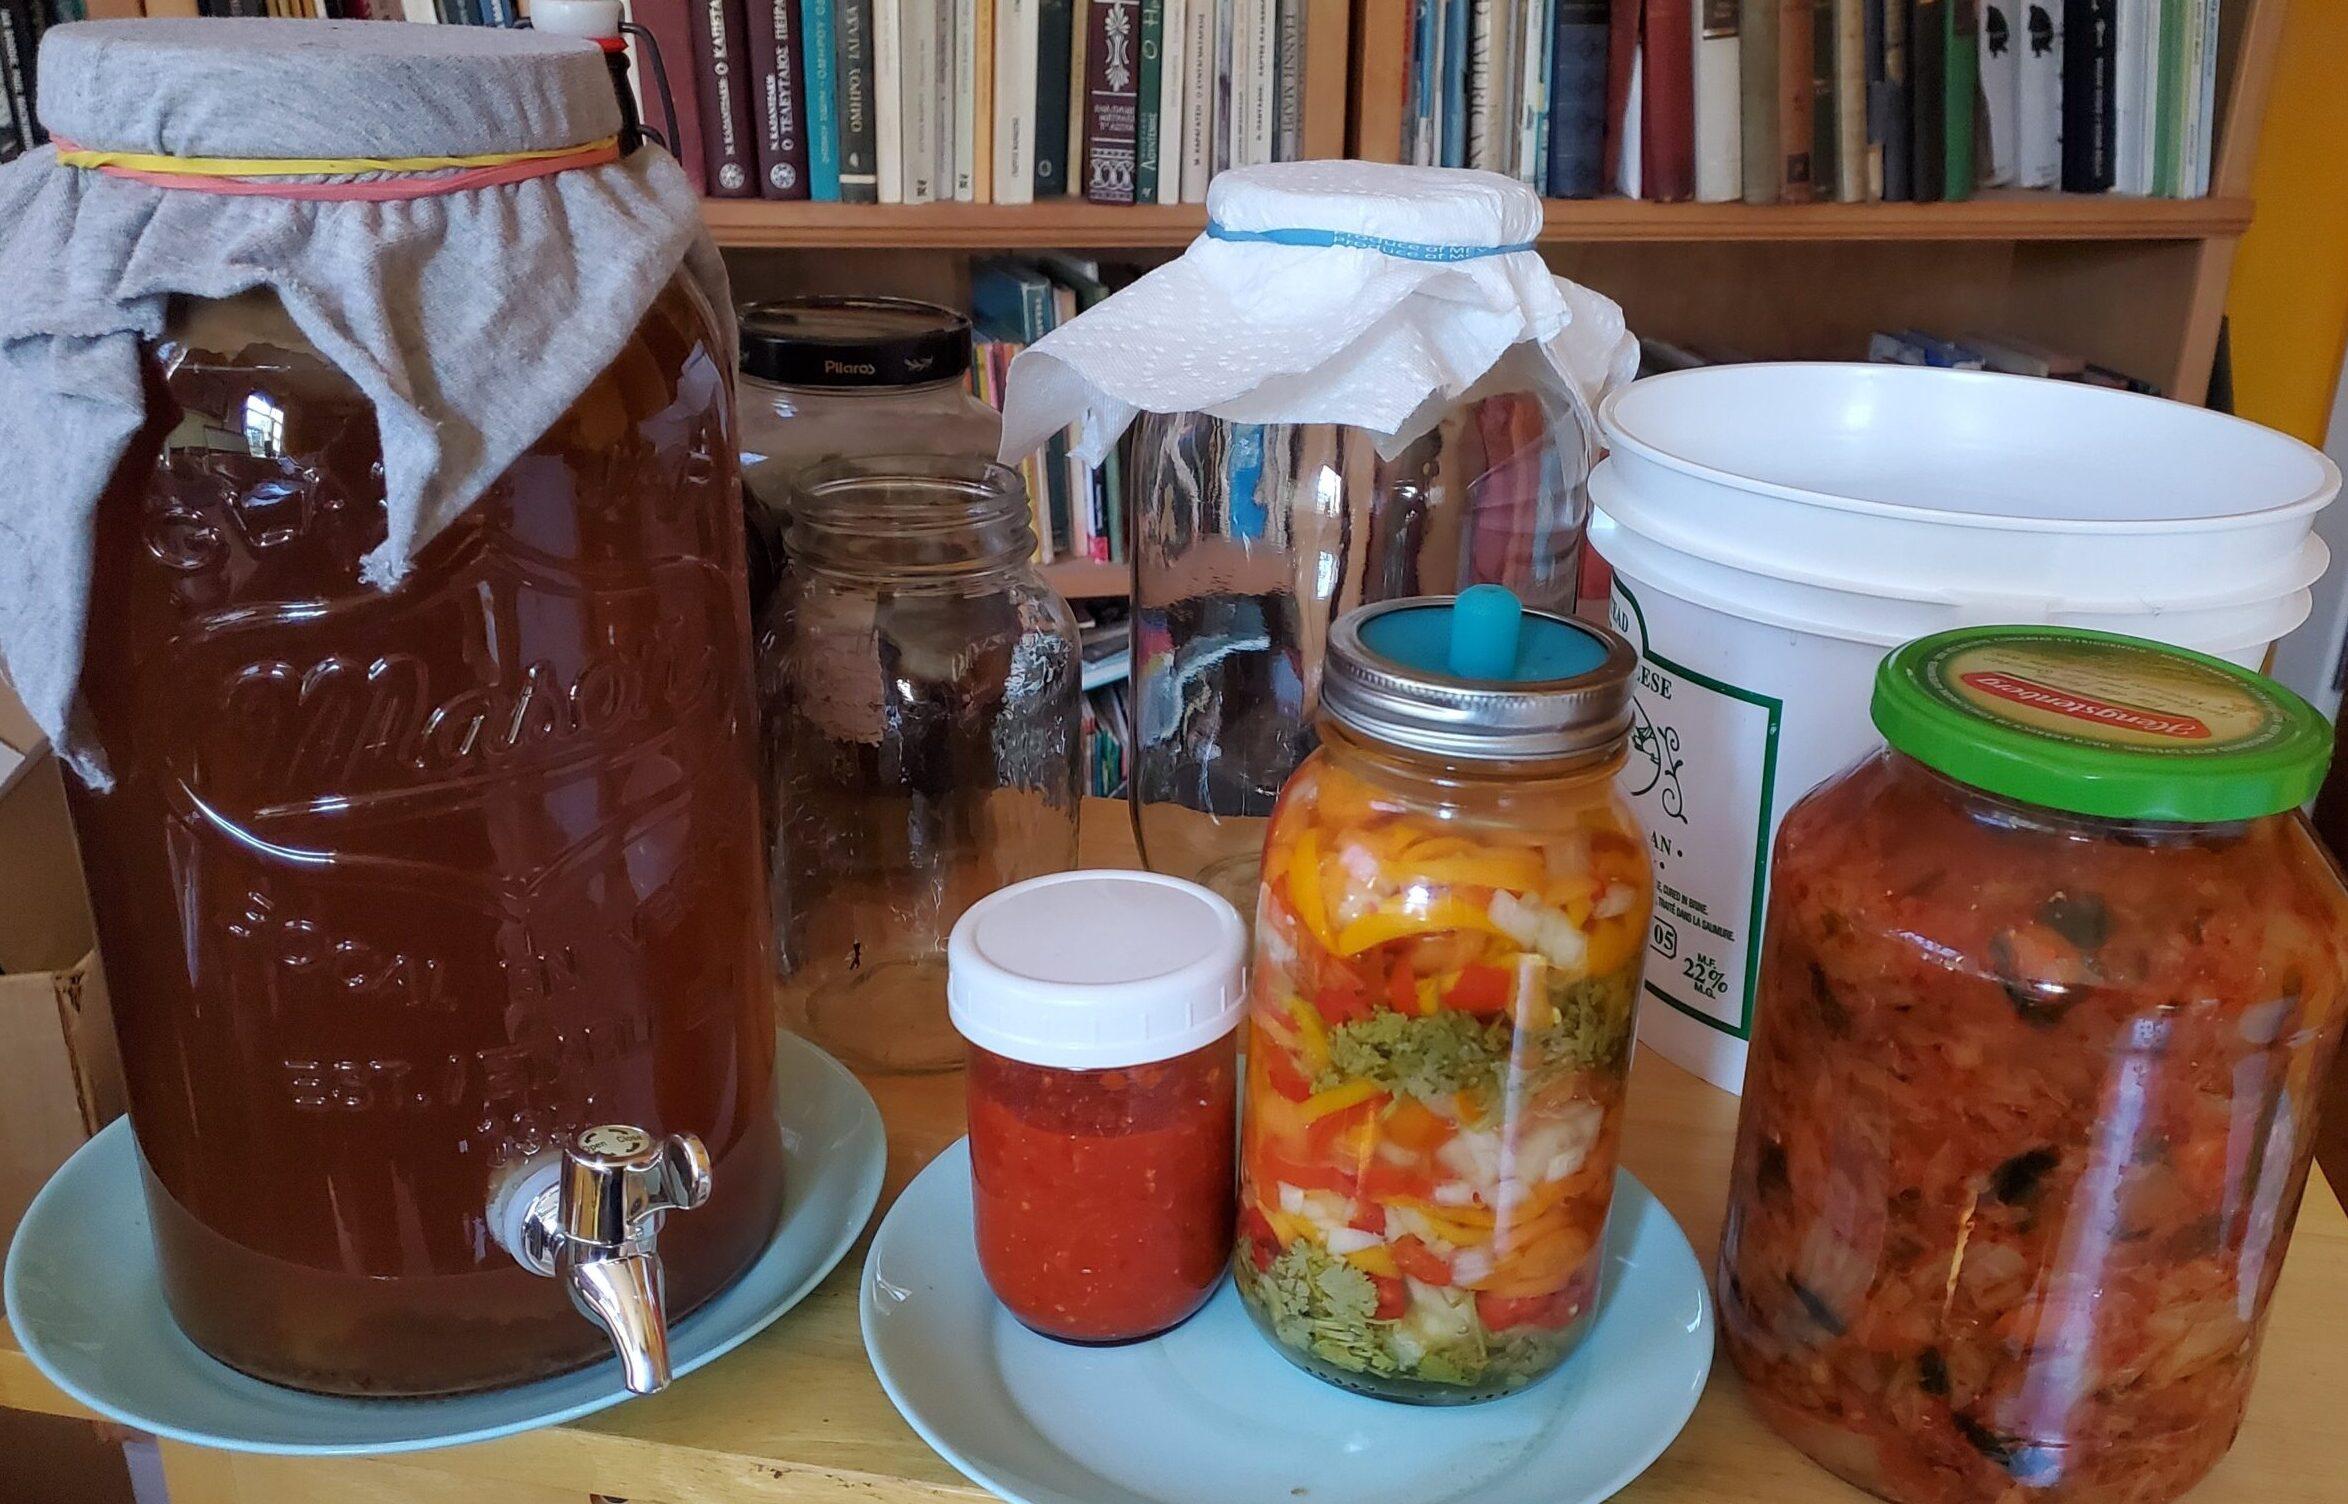 Sideboard with jars of pickles, hot sauce, kimchi and kombucha